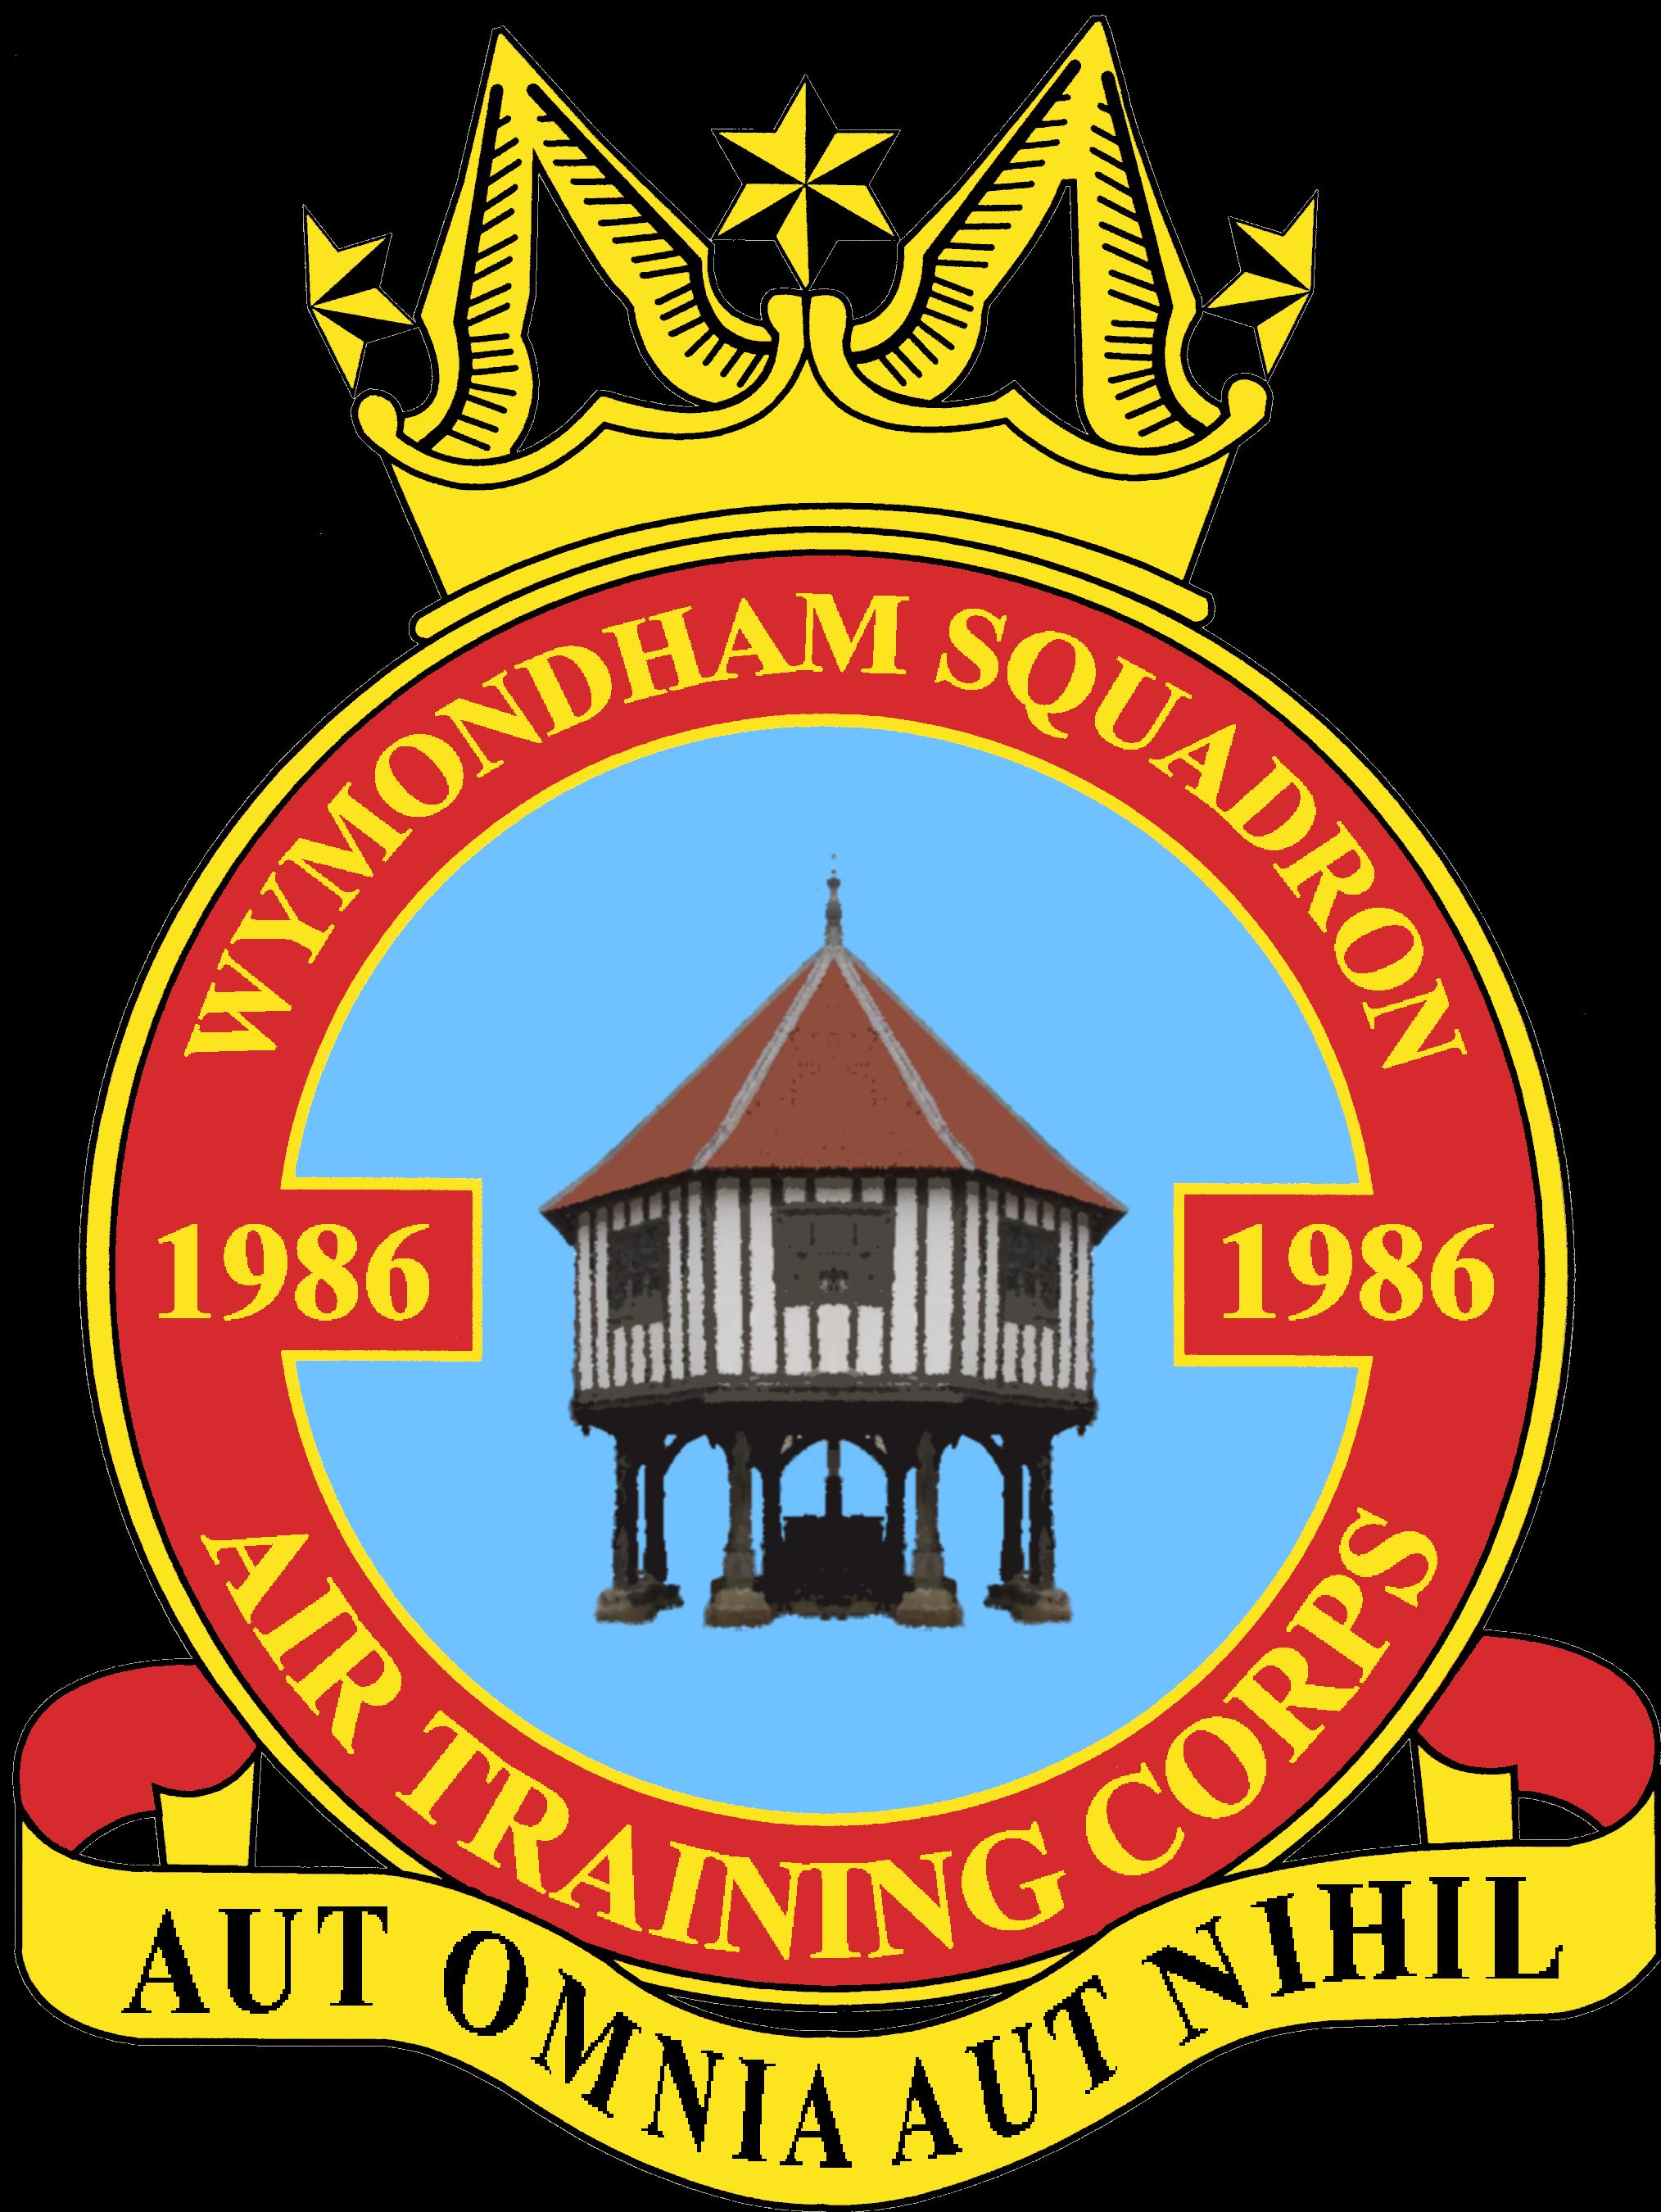 Drill clipart first aid. Training wymondham sqn atc